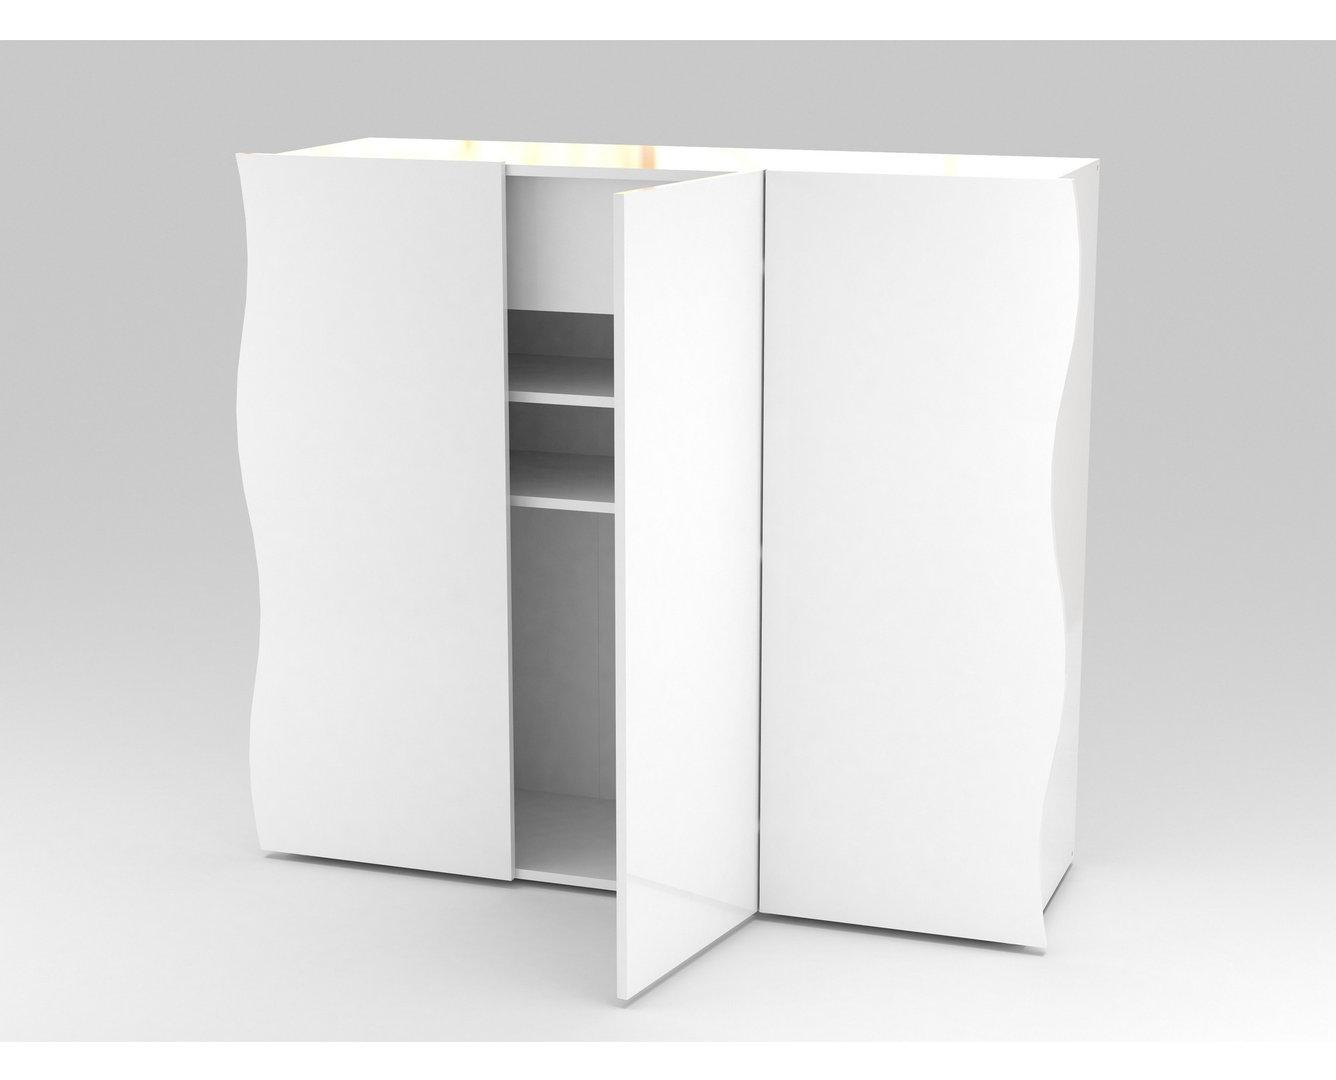 Credenza Moderna Per Ingresso : Entrata moderna goccia xl mobili per ingresso